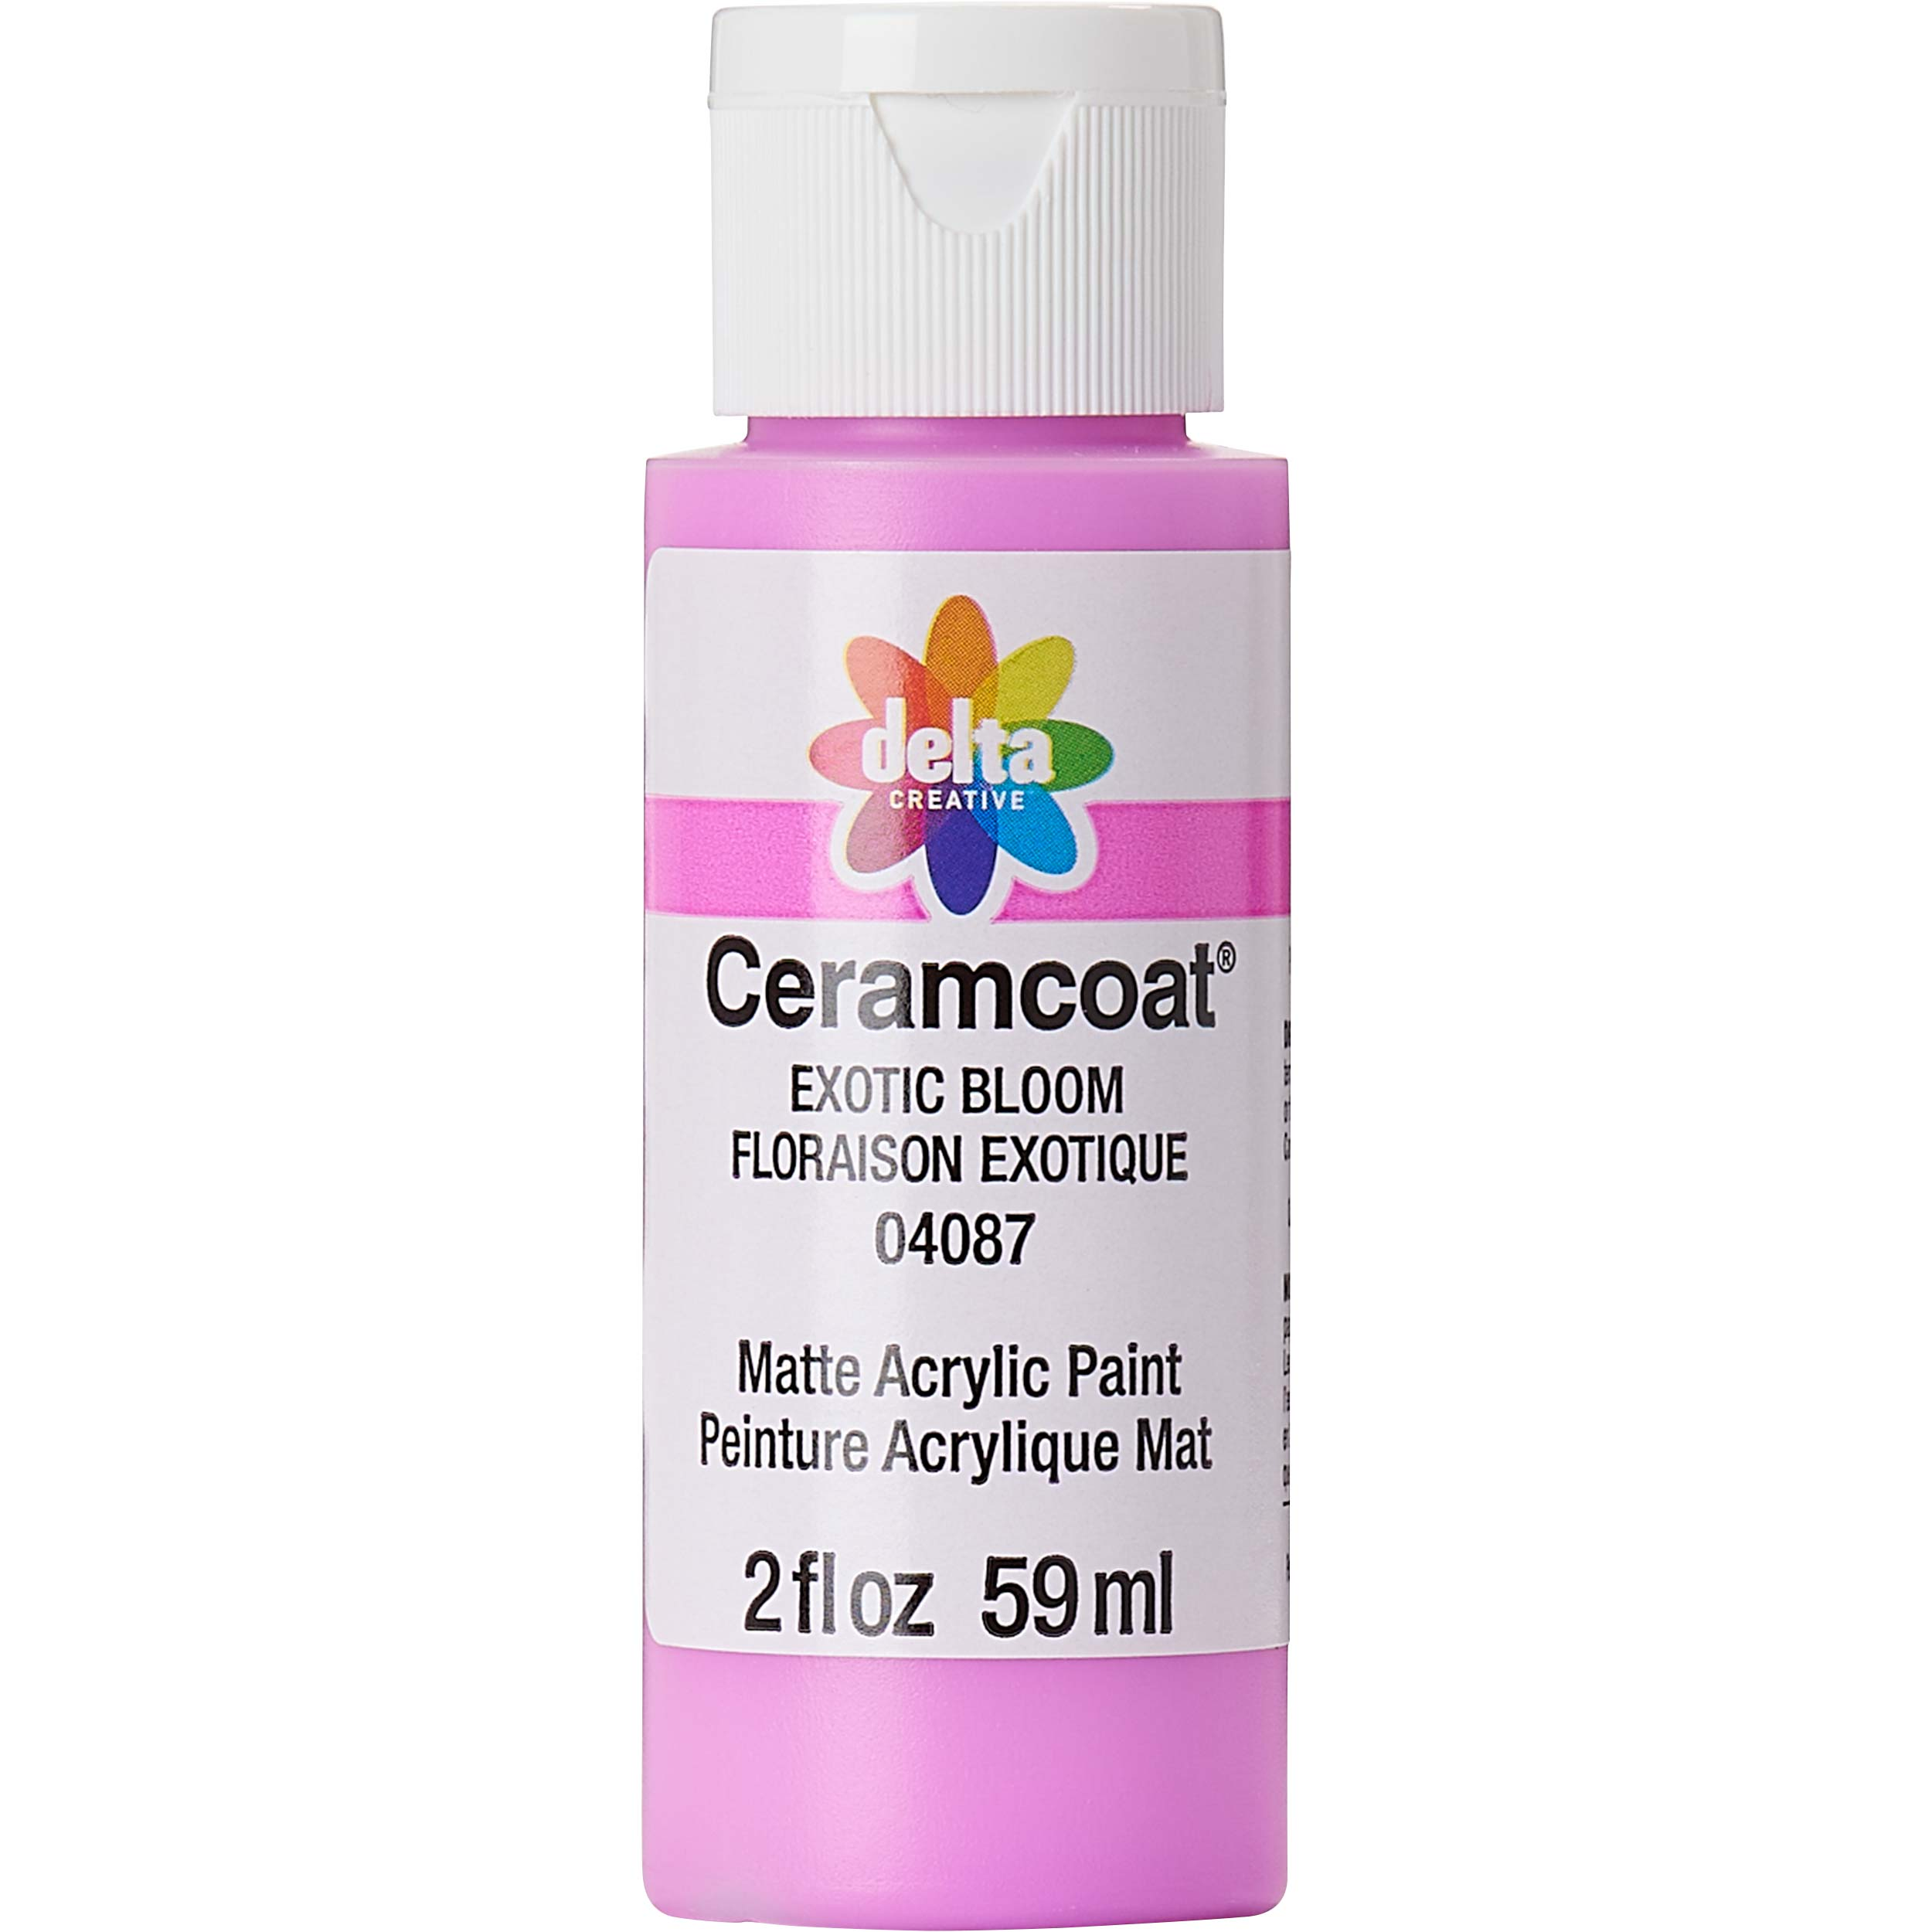 Delta Ceramcoat ® Acrylic Paint - Exotic Bloom, 2 oz. - 04087